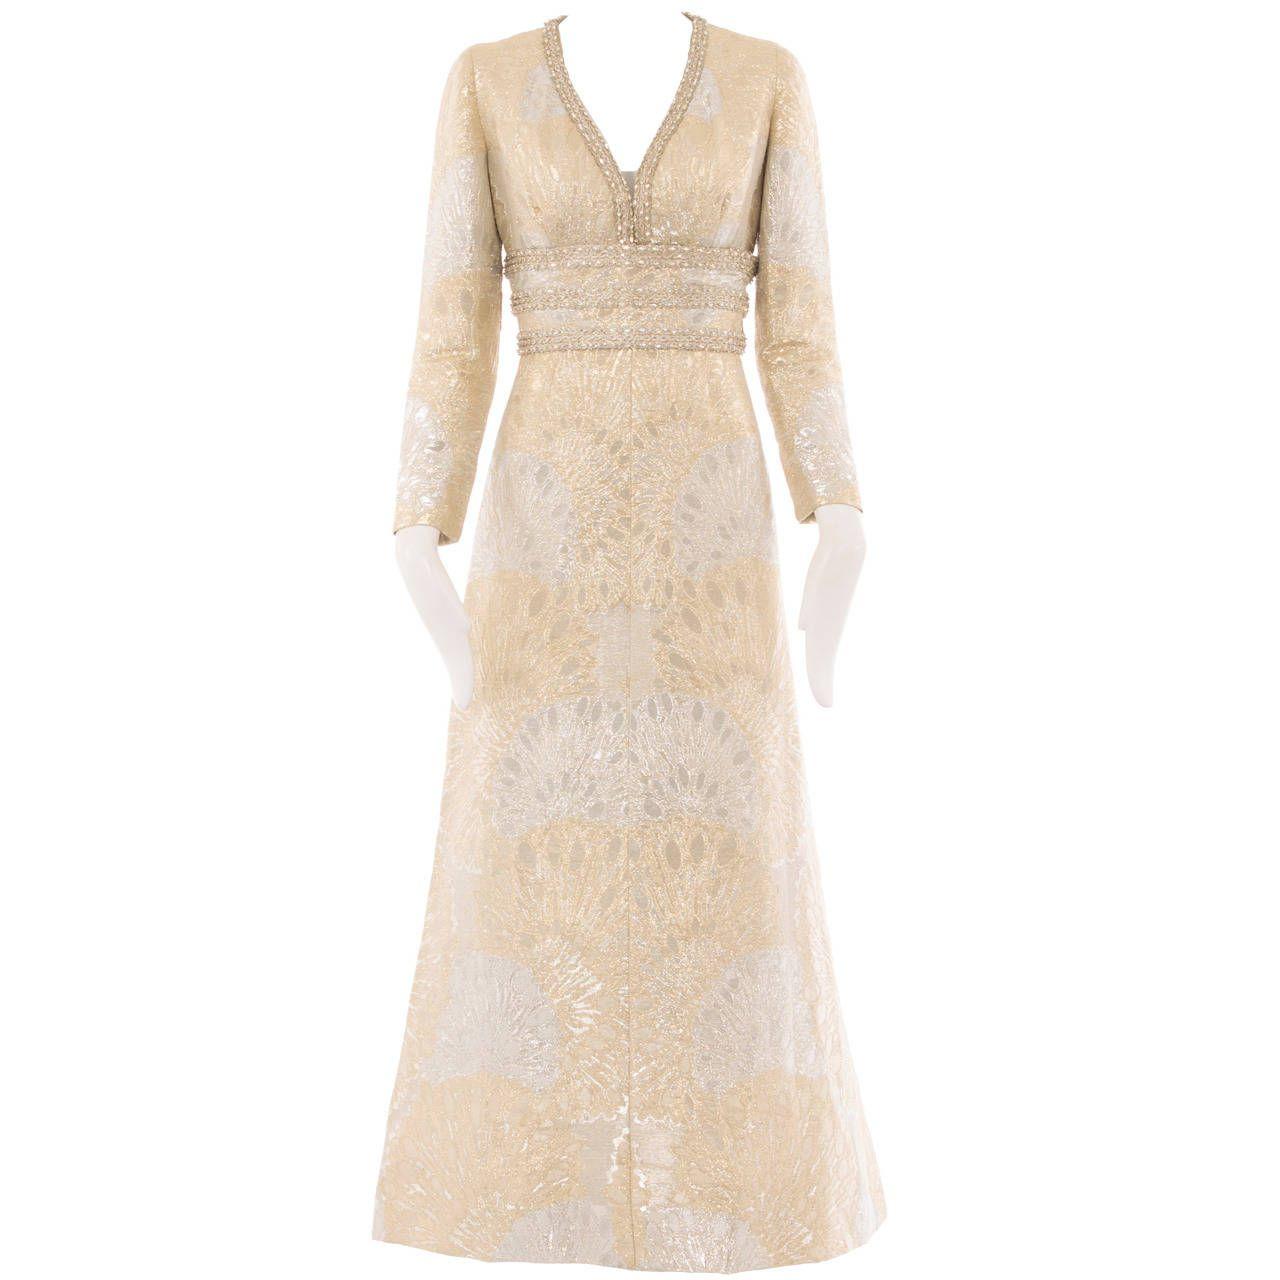 cca7046fcff An Yves Saint Laurent Patron Original dress, autumn winter 1969 | From a  collection of